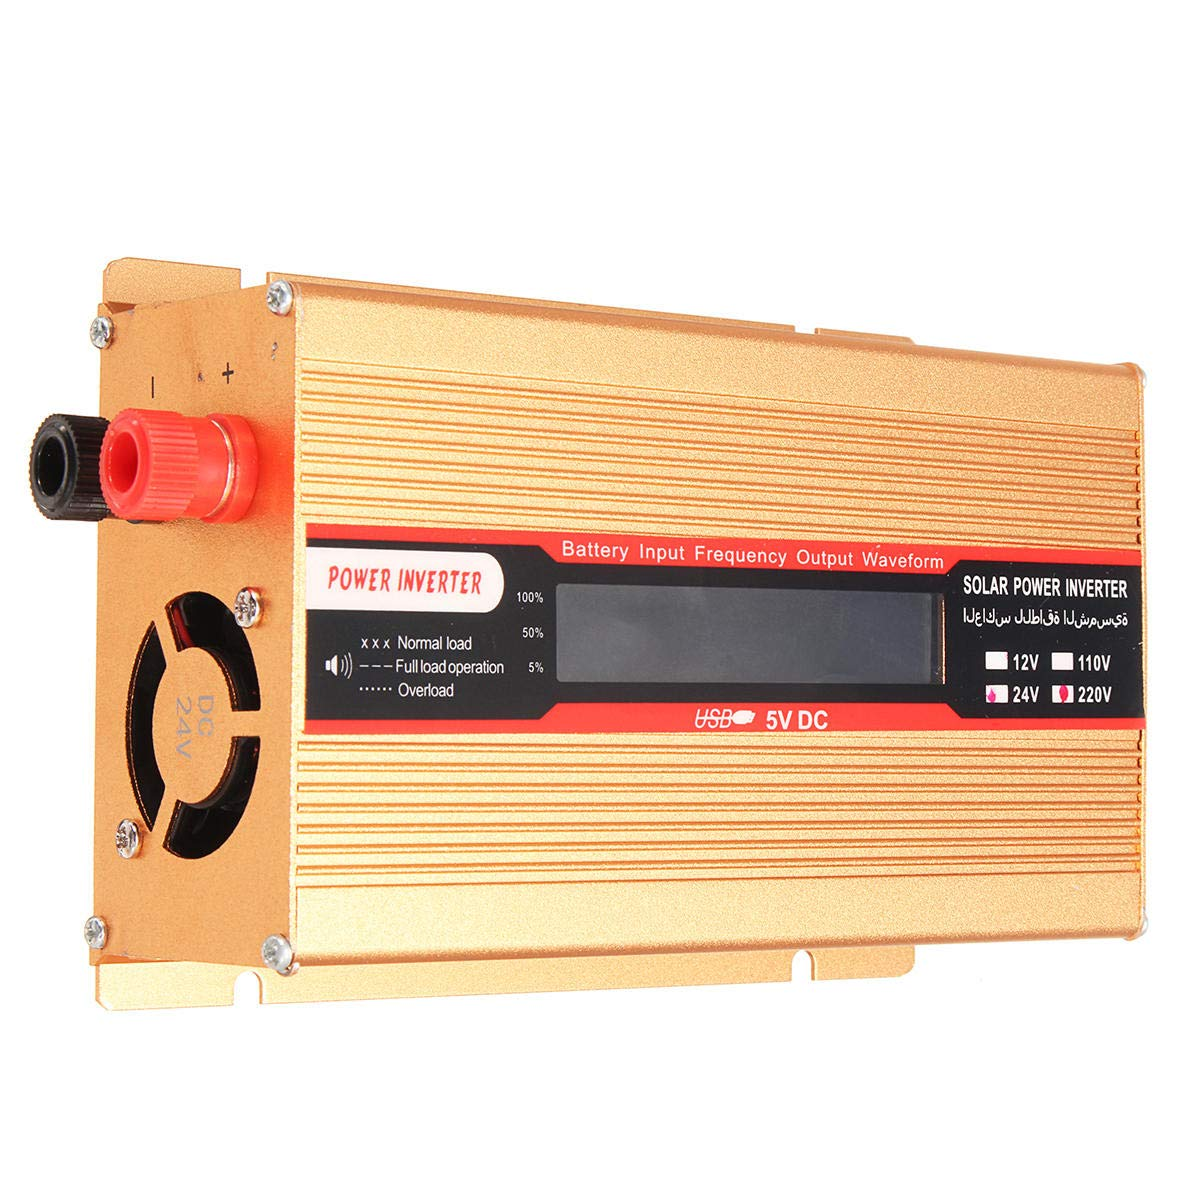 Anddoa DC 12V/24V to AC 220V/110V 1000W Solar Power Inverter Modified Sine Wave LCD Voltage Display - 24V-110V